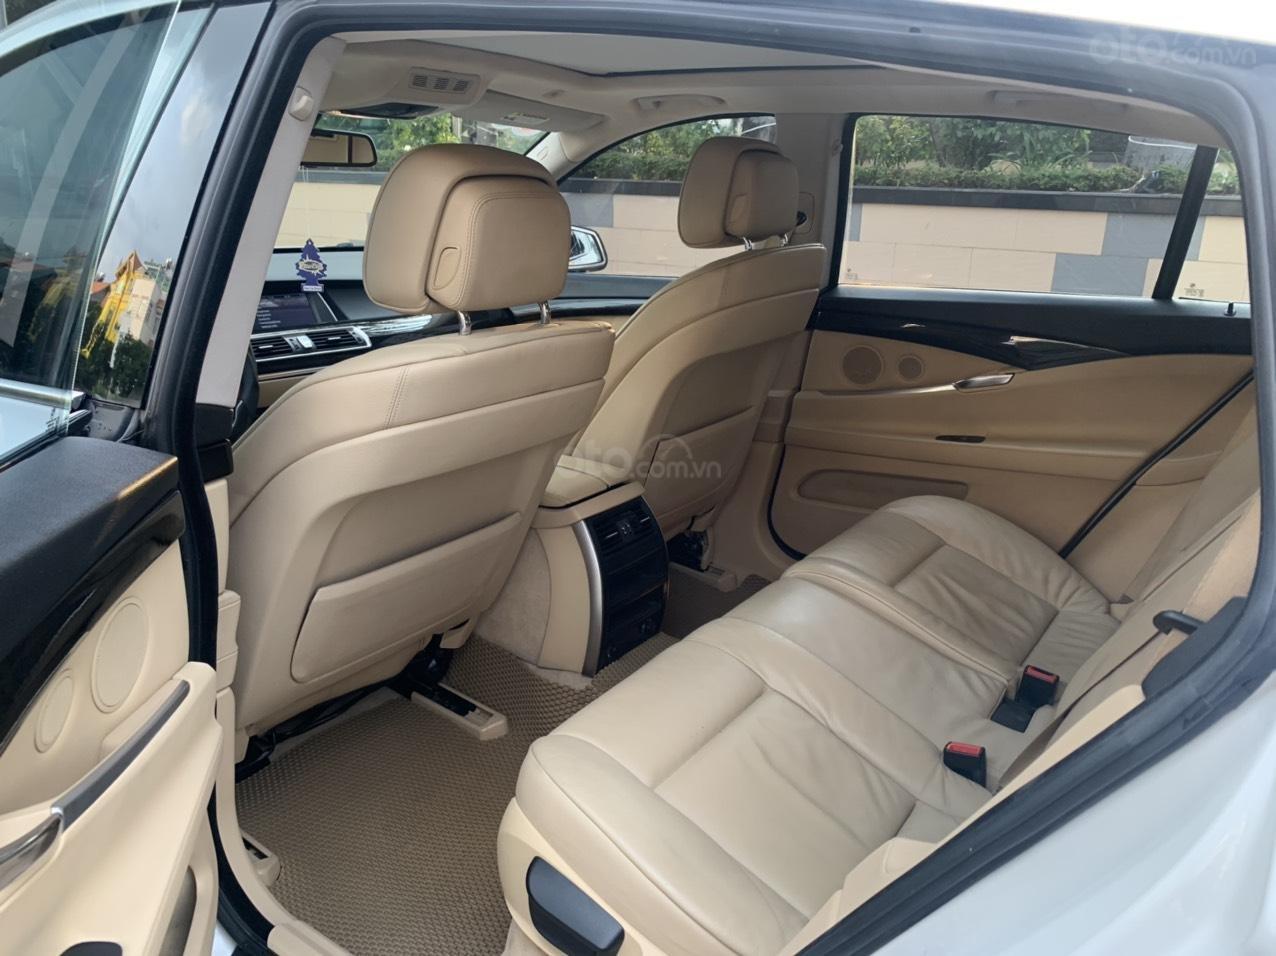 Cần bán gấp BMW 535GT SX 2011, giá 960 triệu (4)